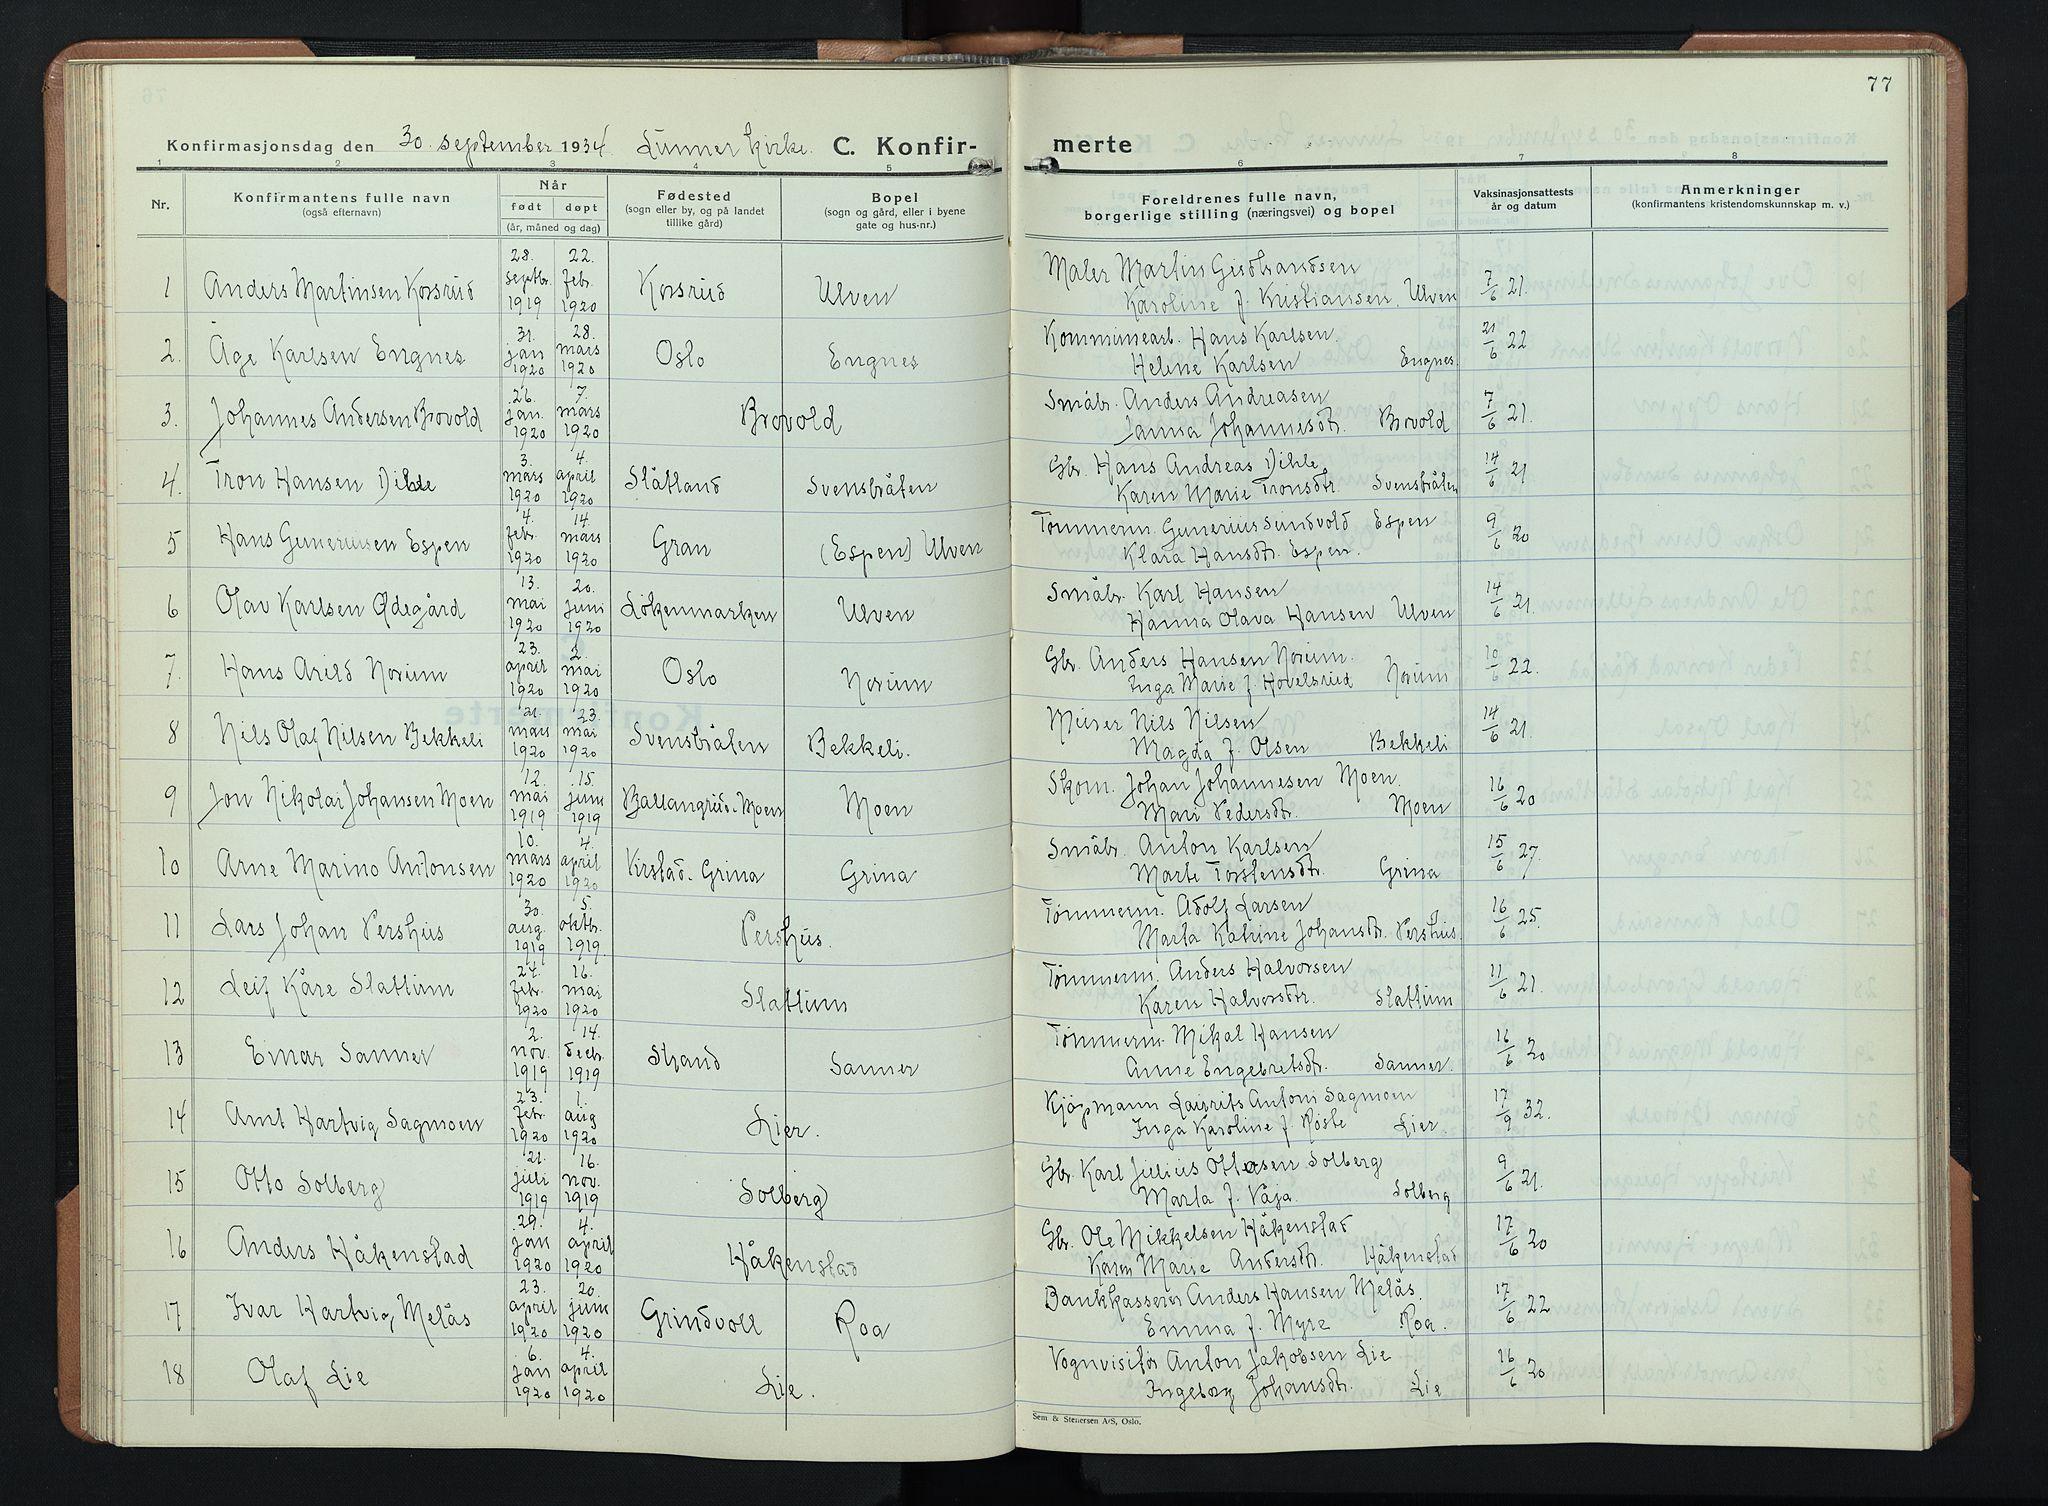 SAH, Lunner prestekontor, H/Ha/Hab/L0003: Klokkerbok nr. 3, 1933-1945, s. 77